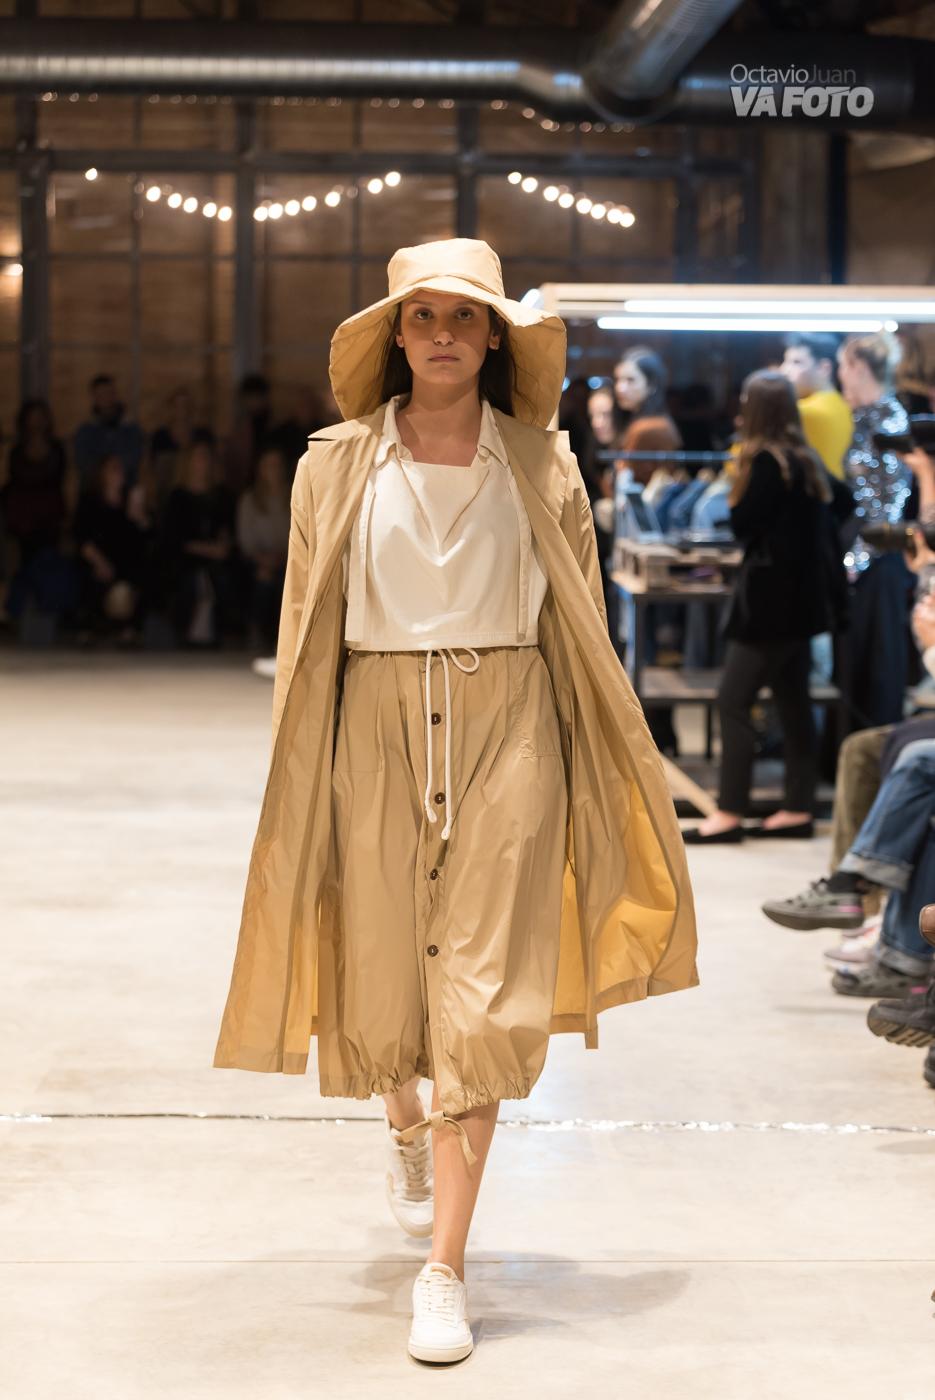 00317 ARTEMODA DSC4416 20181124 - Evento: Arte + Moda Valencia